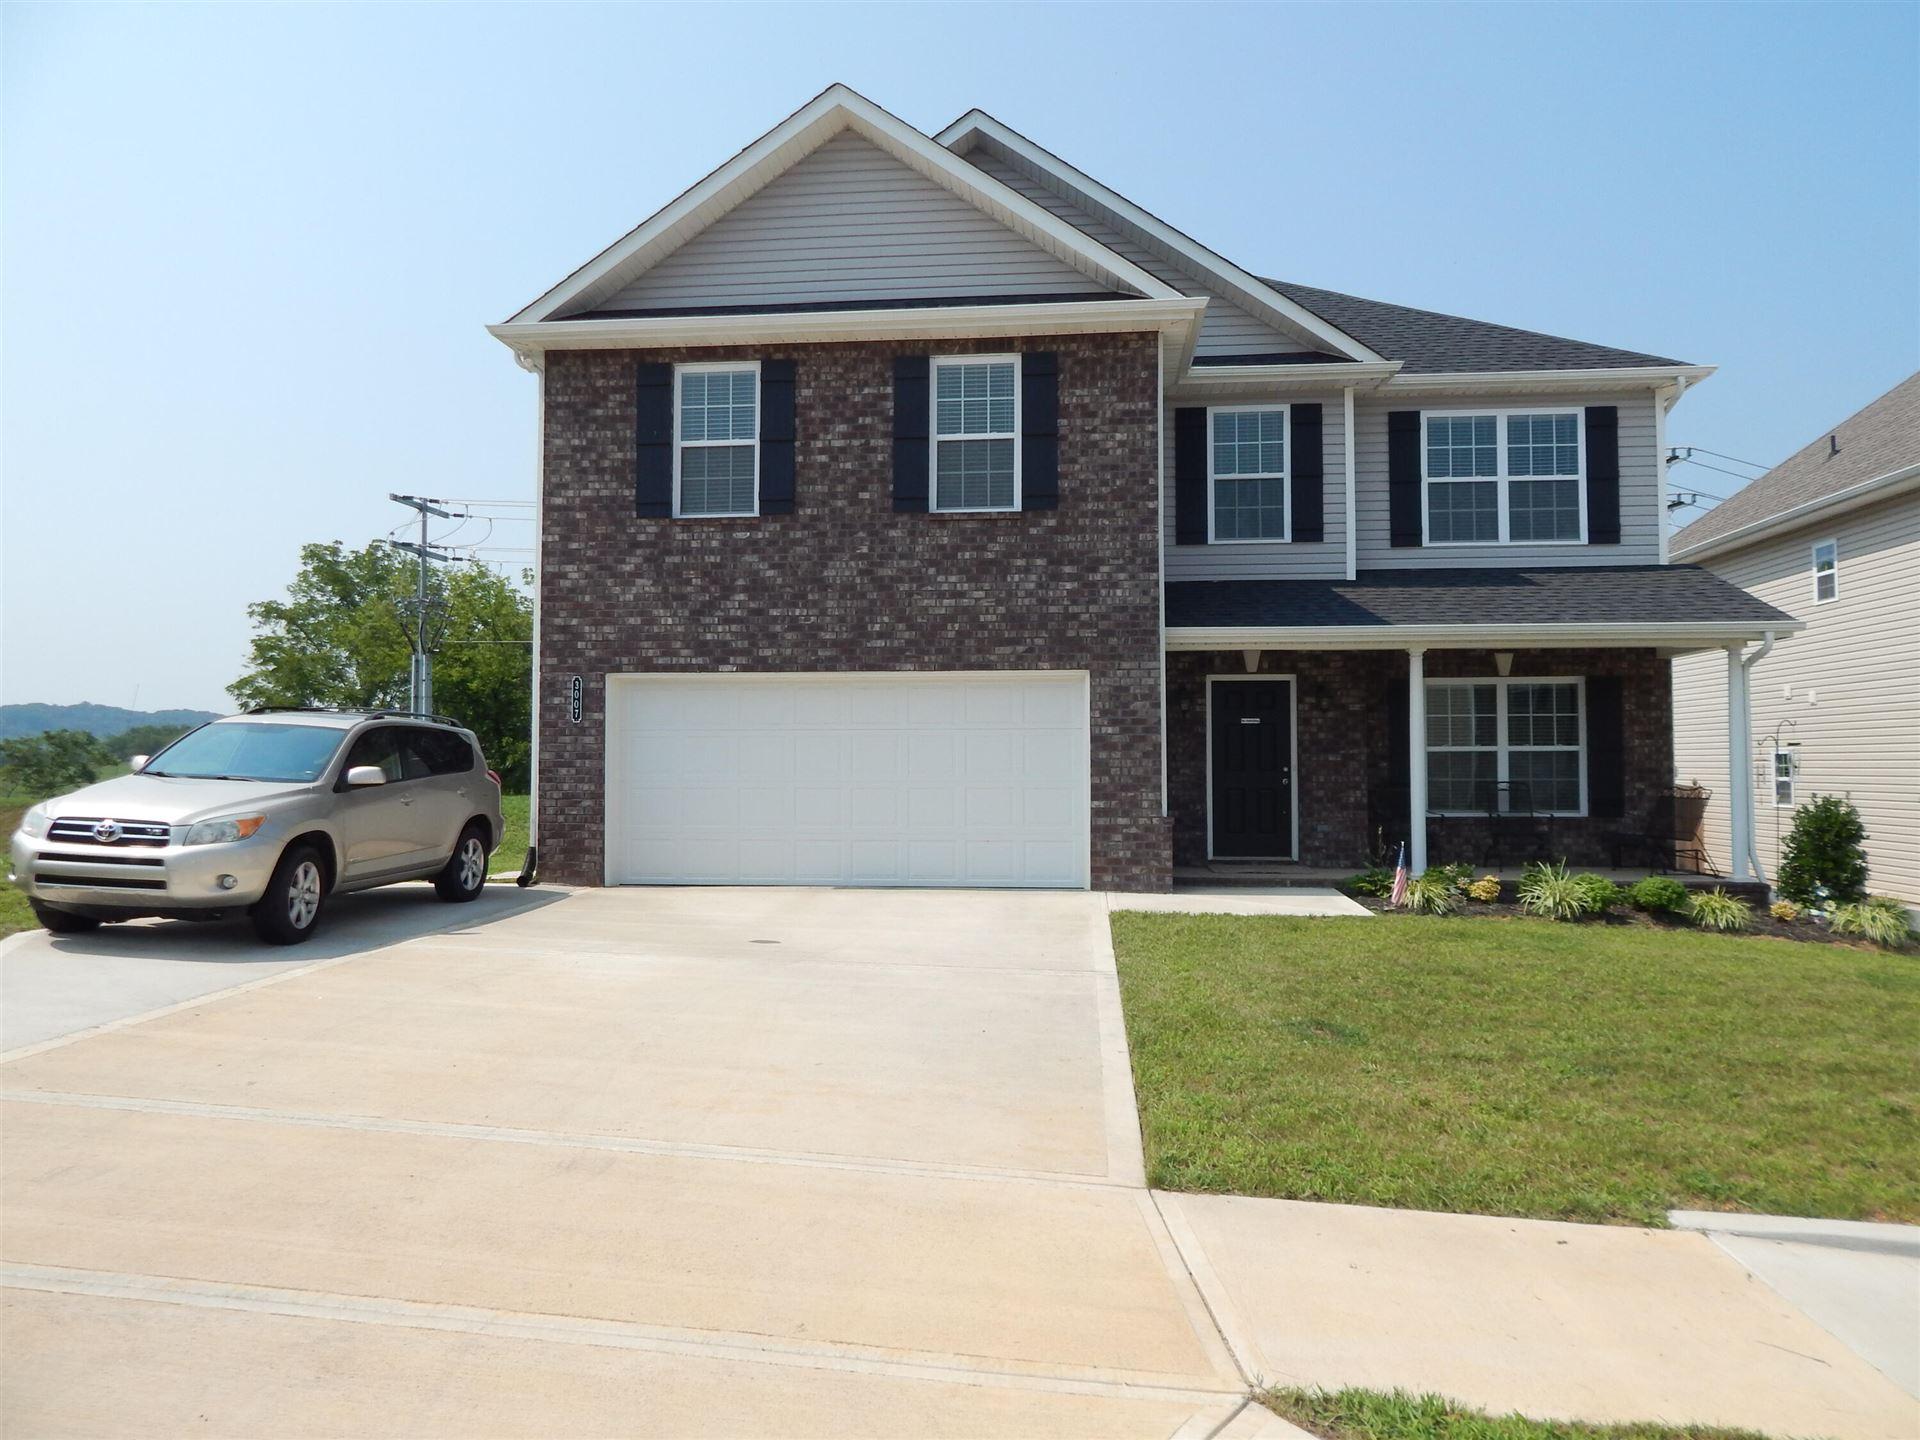 Photo of 3007 Creekbend Lane, Knoxville, TN 37931 (MLS # 1161407)